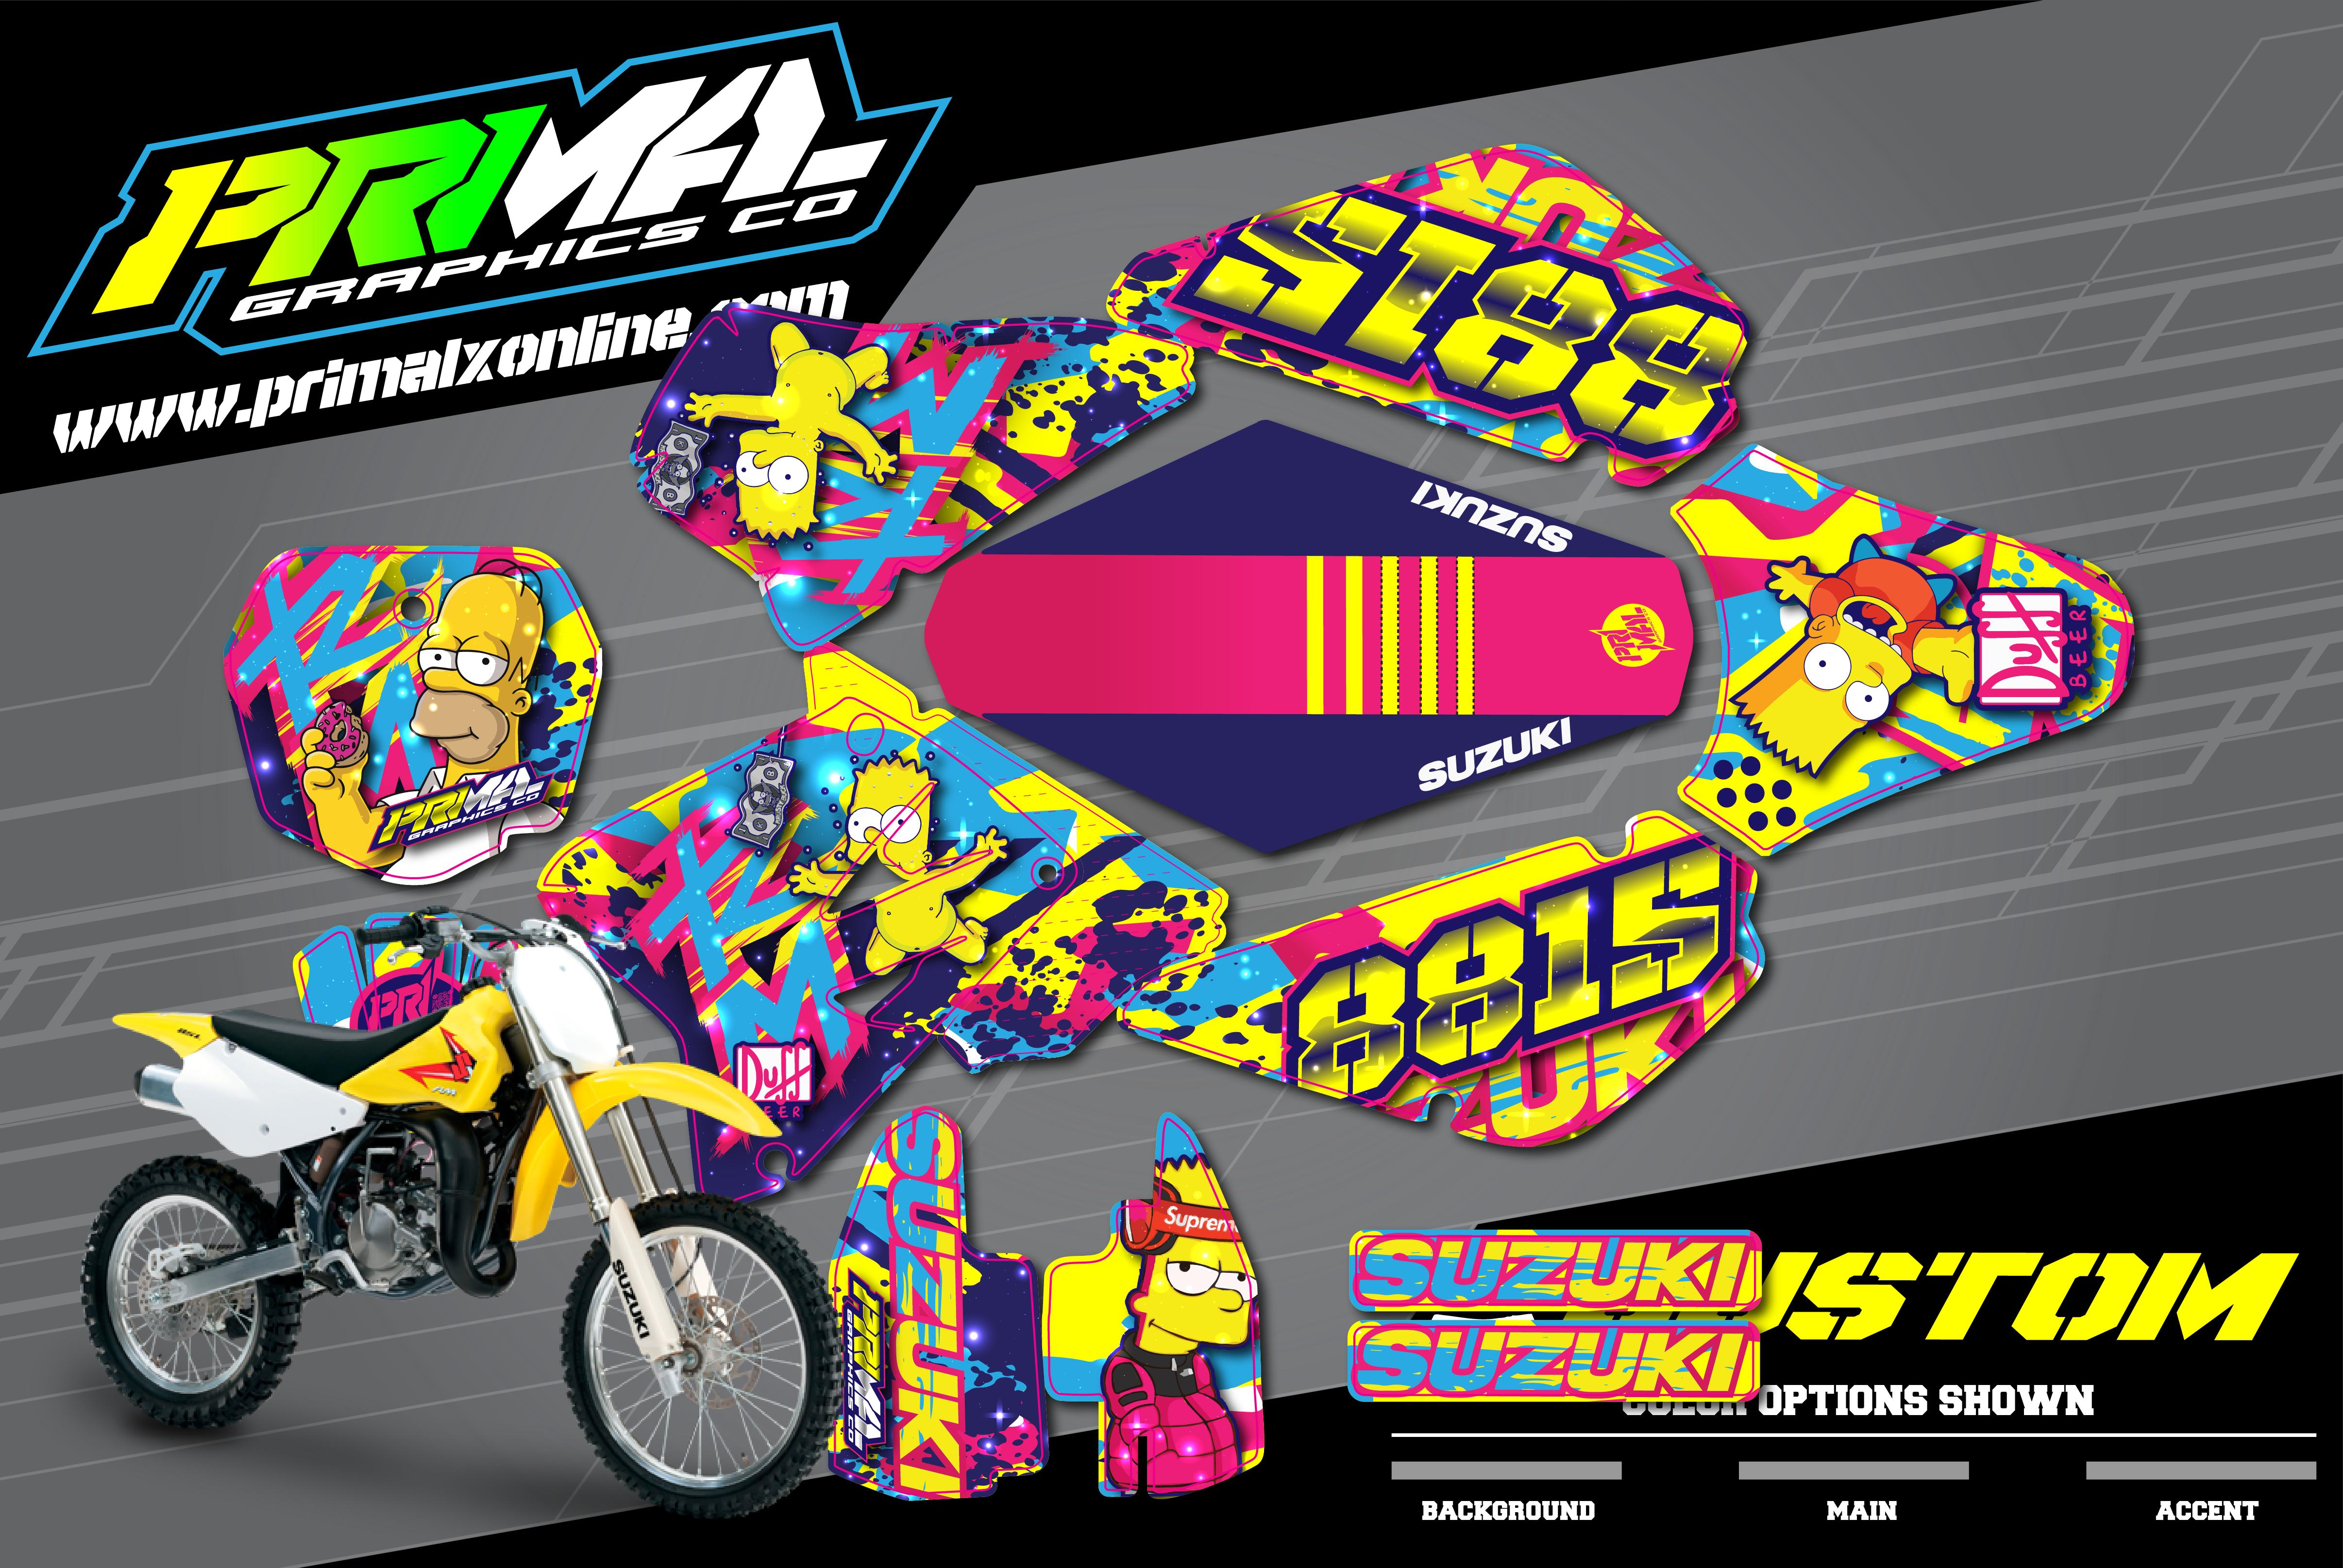 1_PRIMAL-X-MOTORSPORTS-PRIMAL-GRAPHICS-CO-SUZUKI-RM80-RM85-RM100-SUPERMOTO-MOTOCROSS-GRAPHICS-BIKELIFE-CHARMCITY-KINGS-01